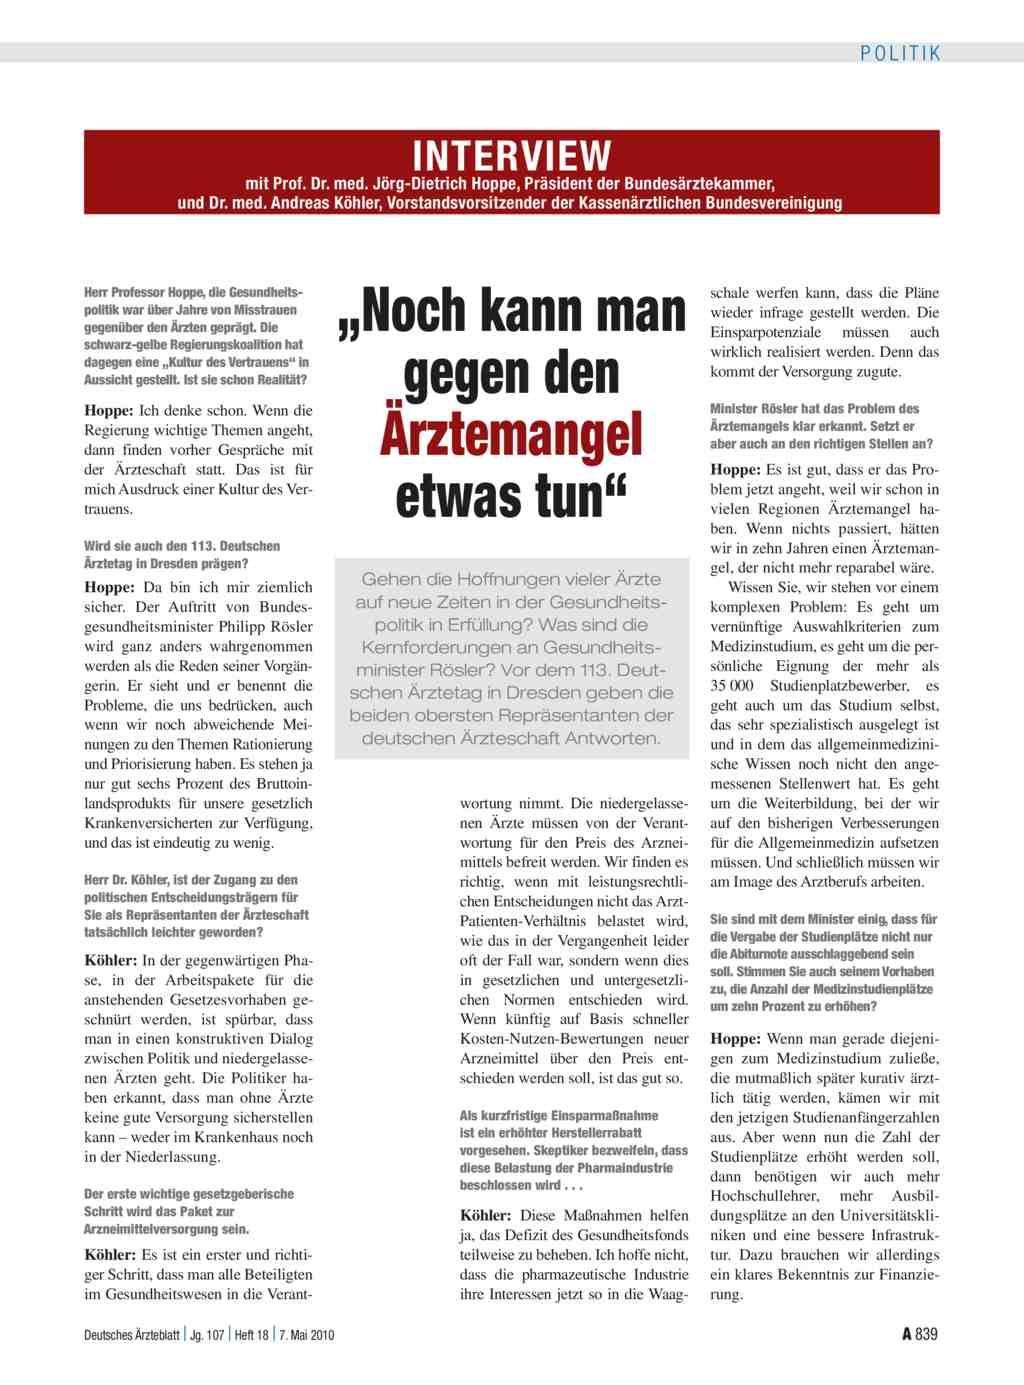 Interview mit Prof. Dr. med. Jörg-Dietrich Hoppe, Präsident der ...